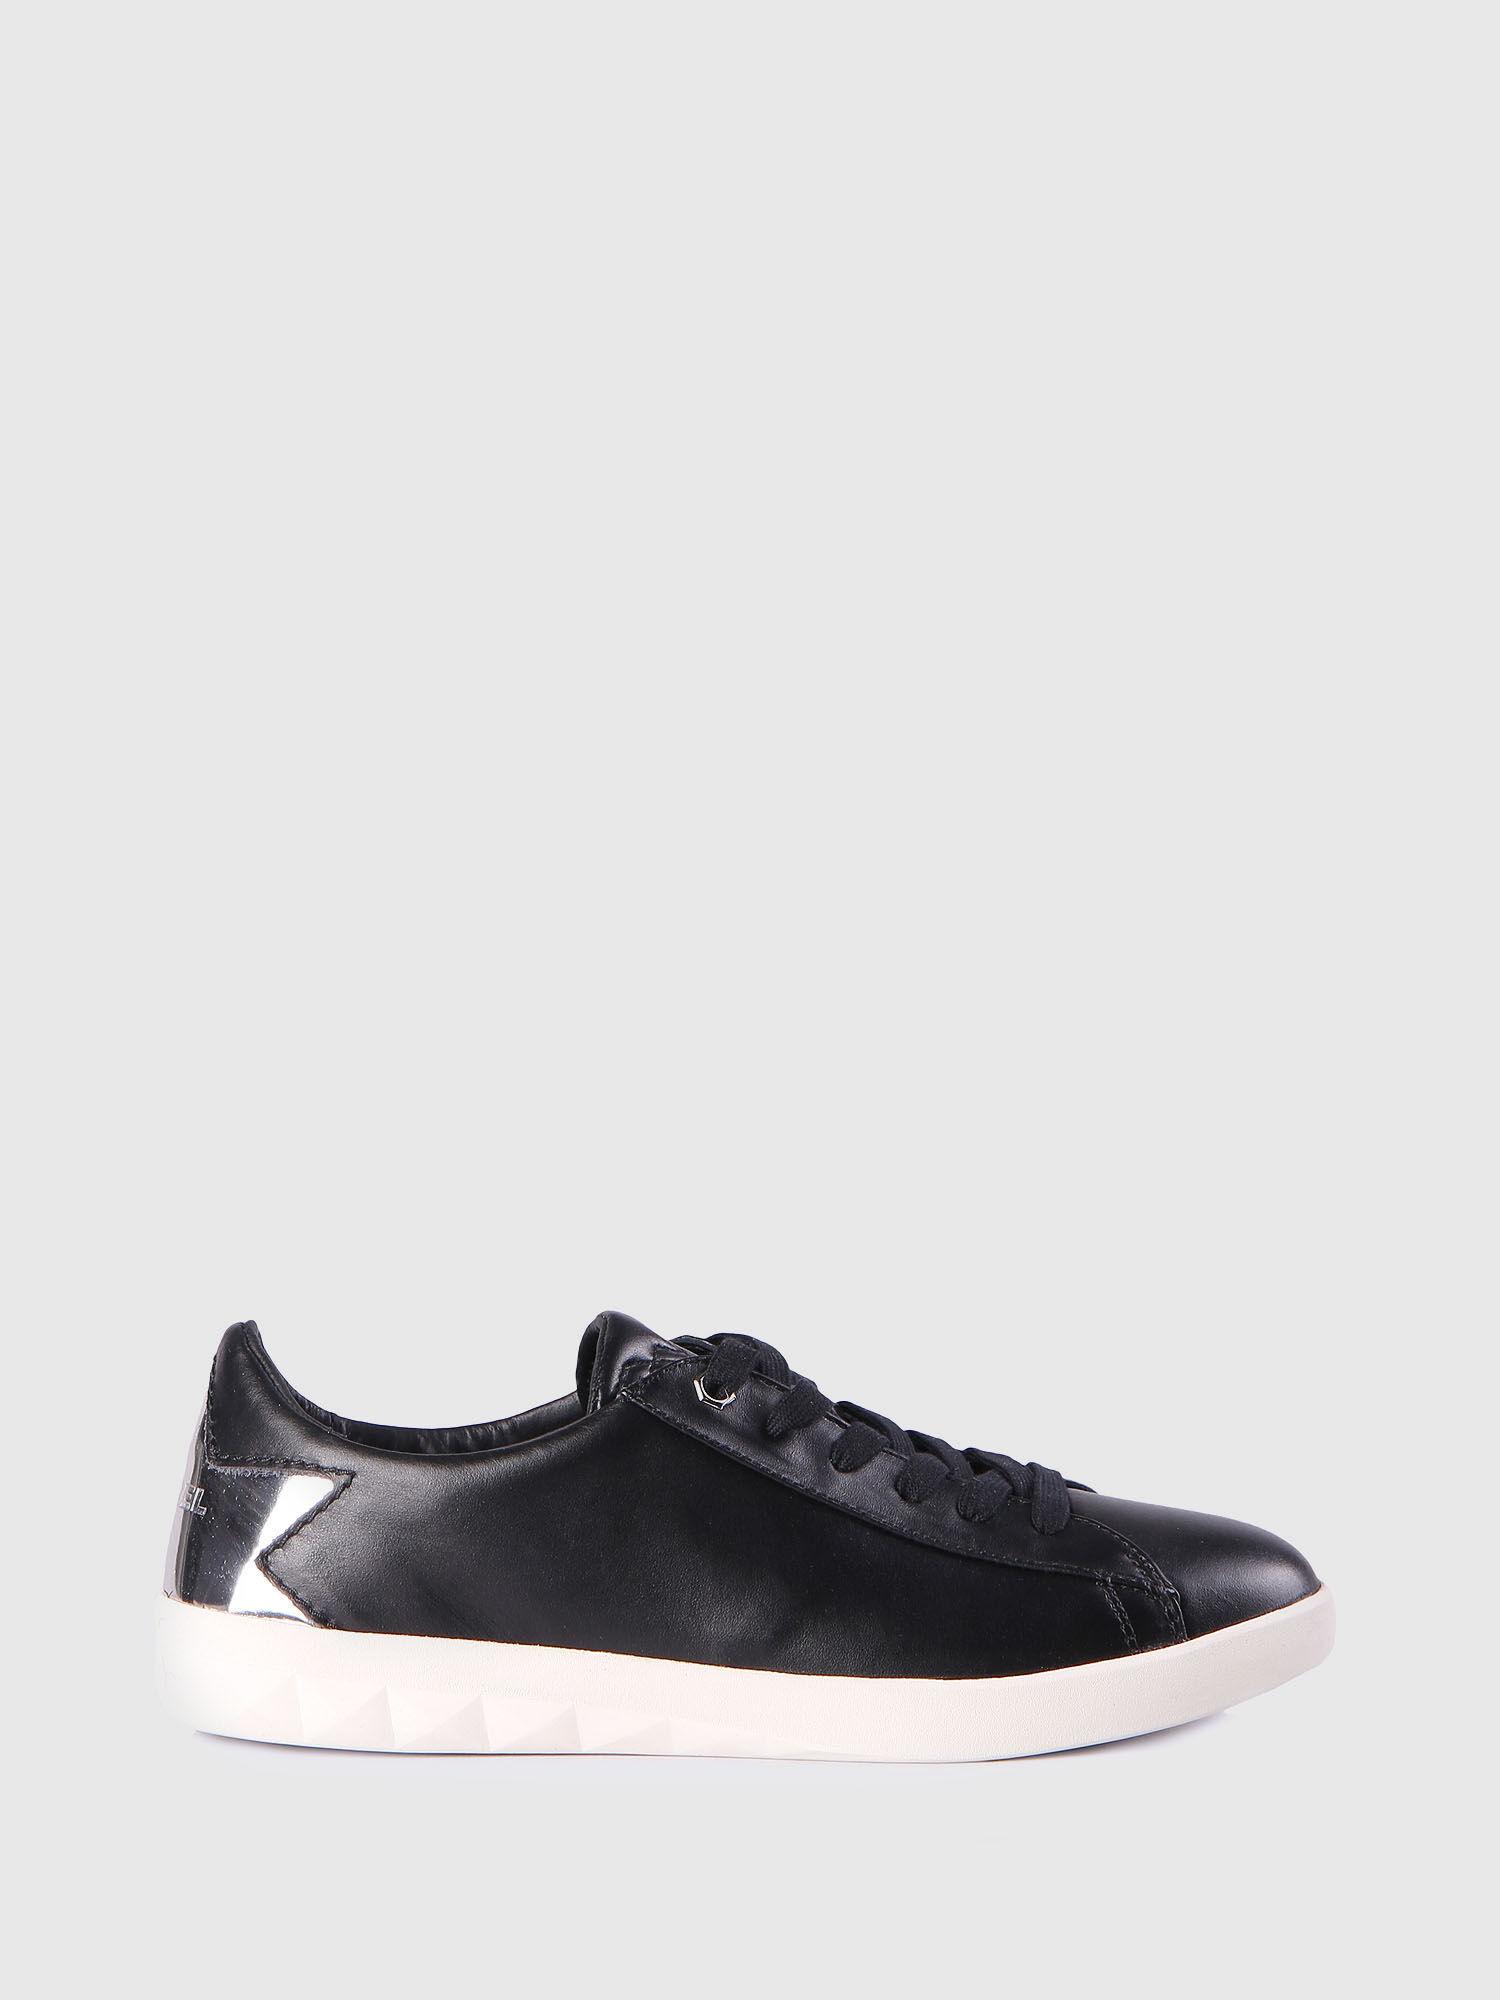 DIESEL Sneakers Soft Leather Footwear White FG49859